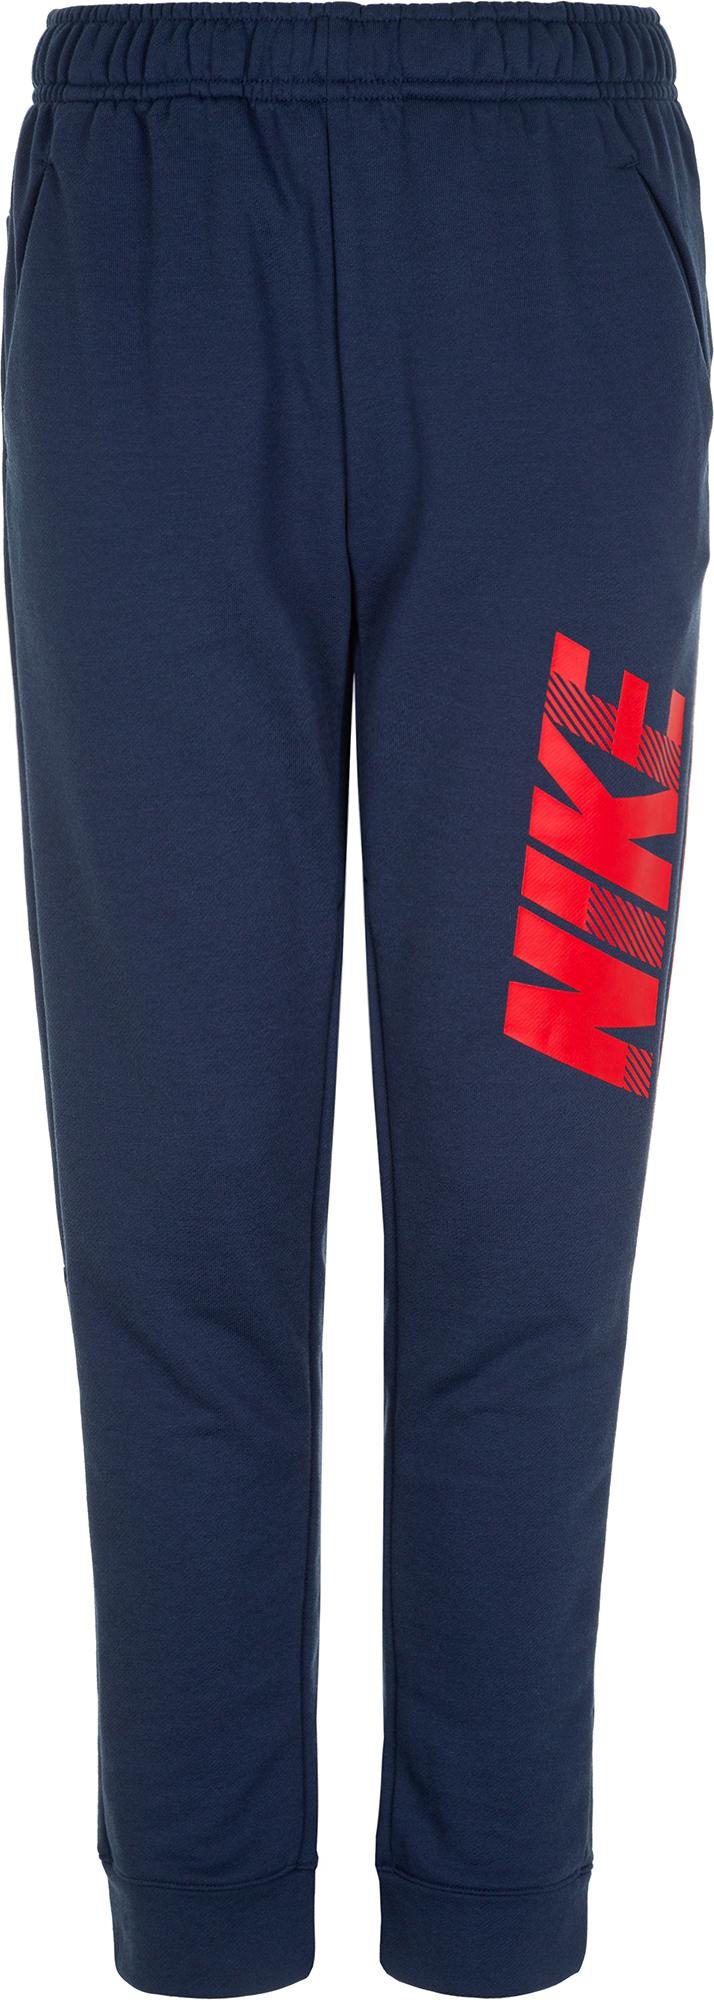 Nike Брюки для мальчиков Nike Dry, размер 158-170 цена и фото